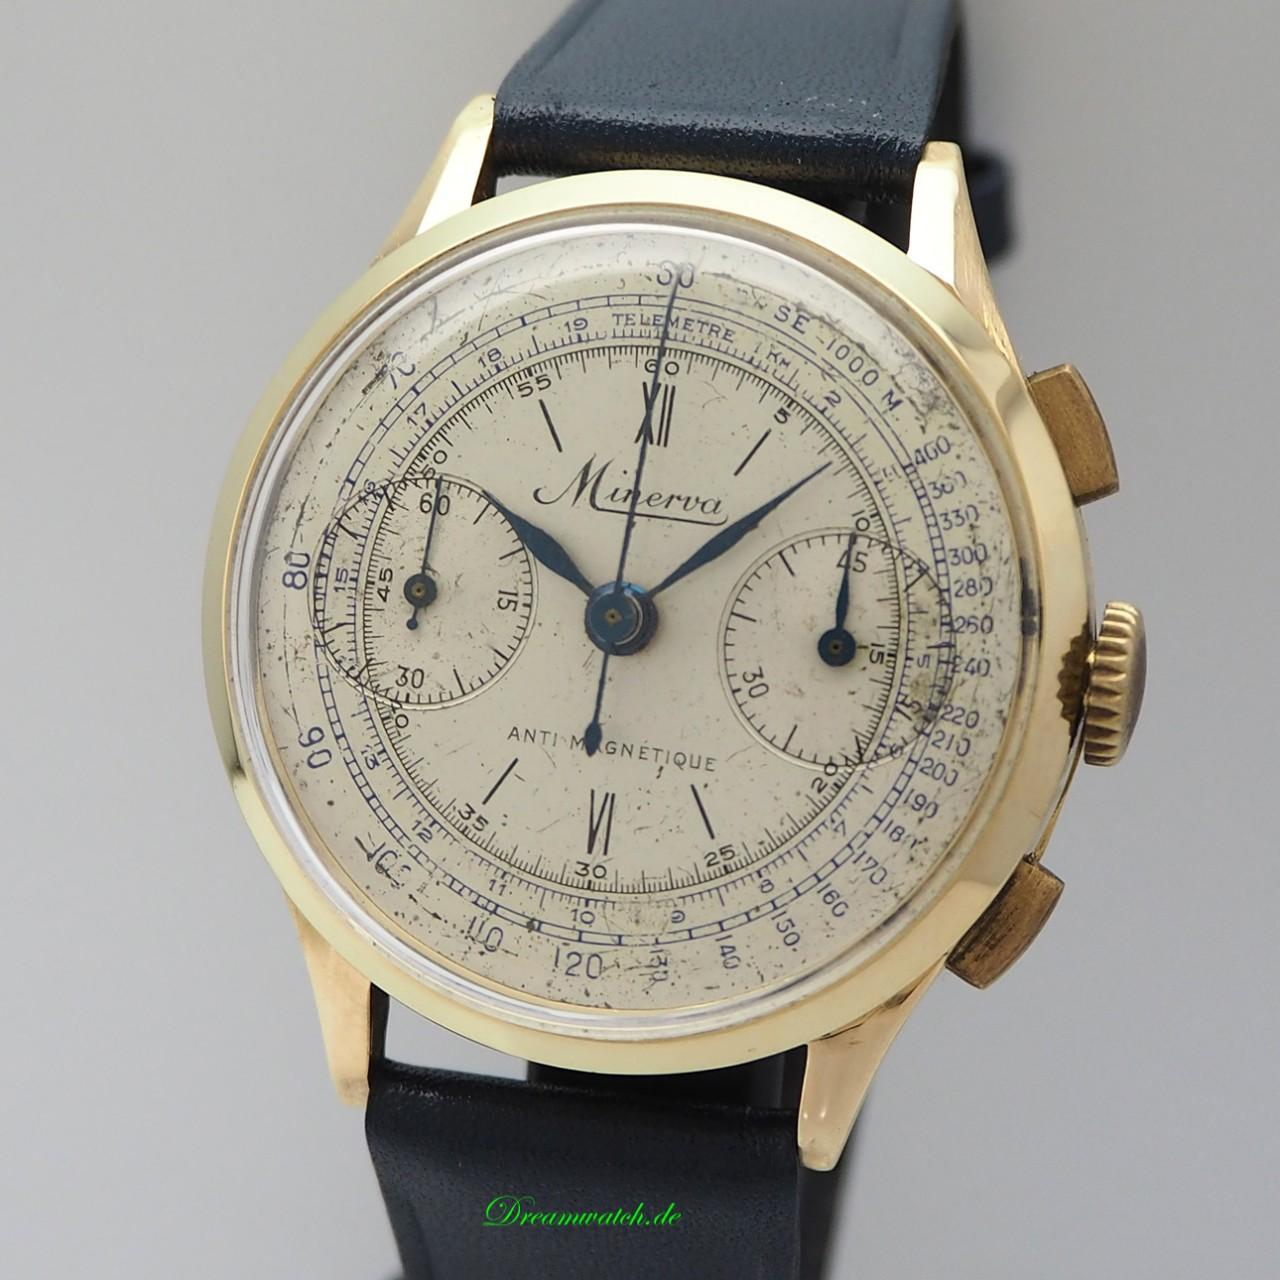 Minerva Vintage Telemetre Chronograph Gold 18k/750, very rare